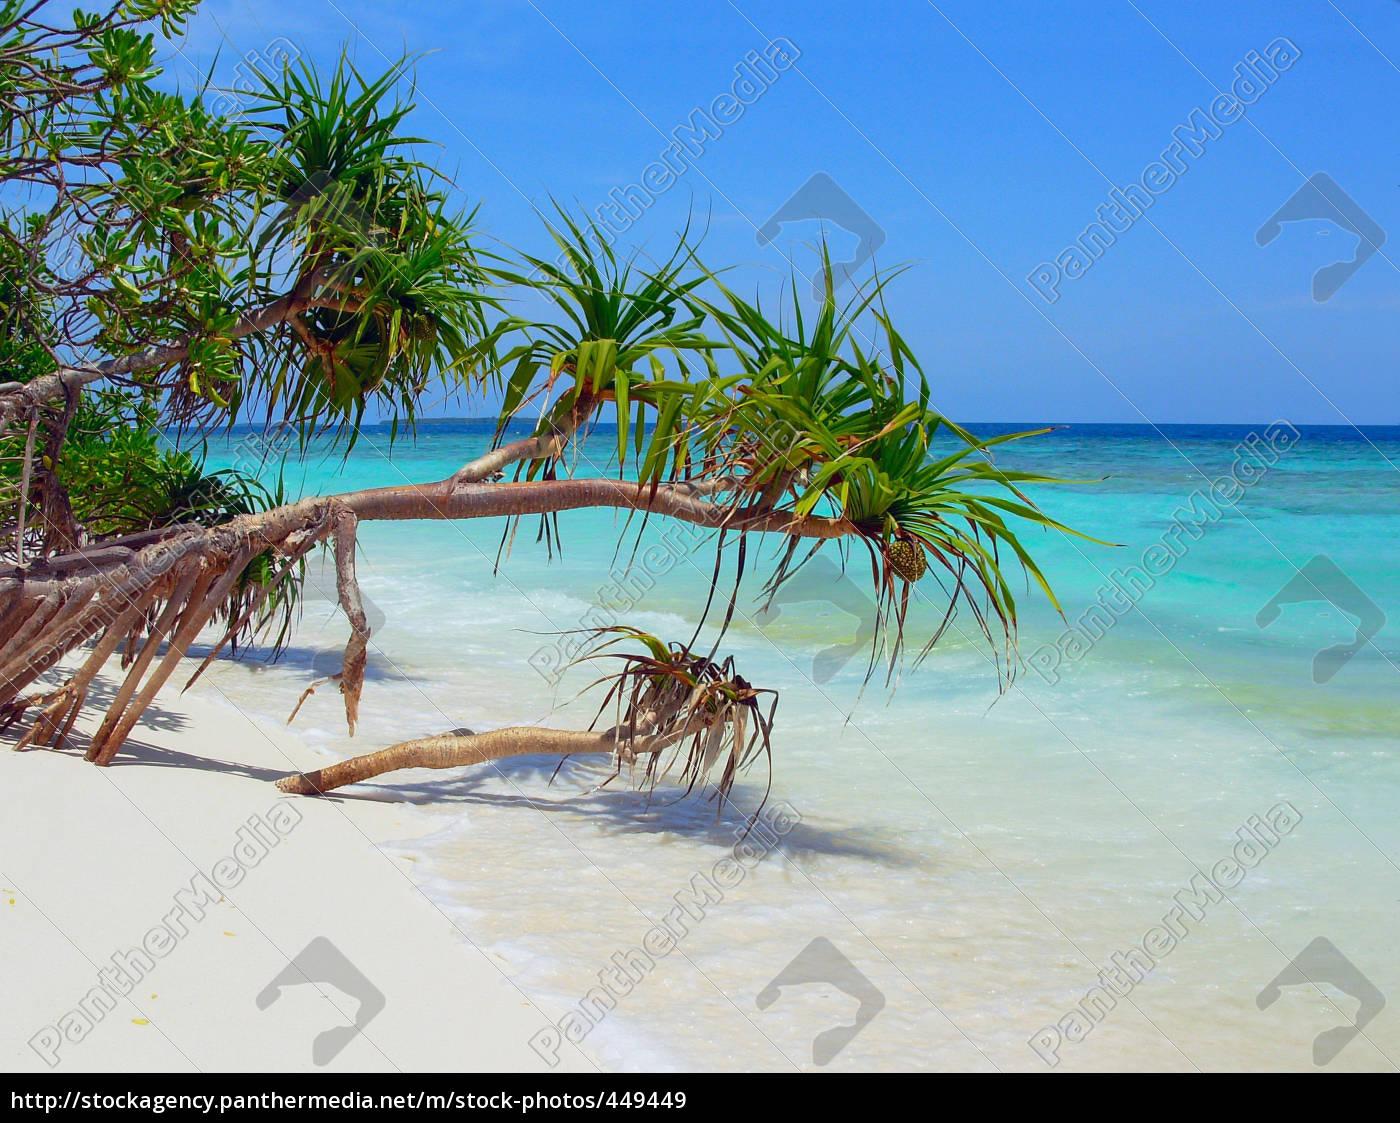 beach, idyll - 449449